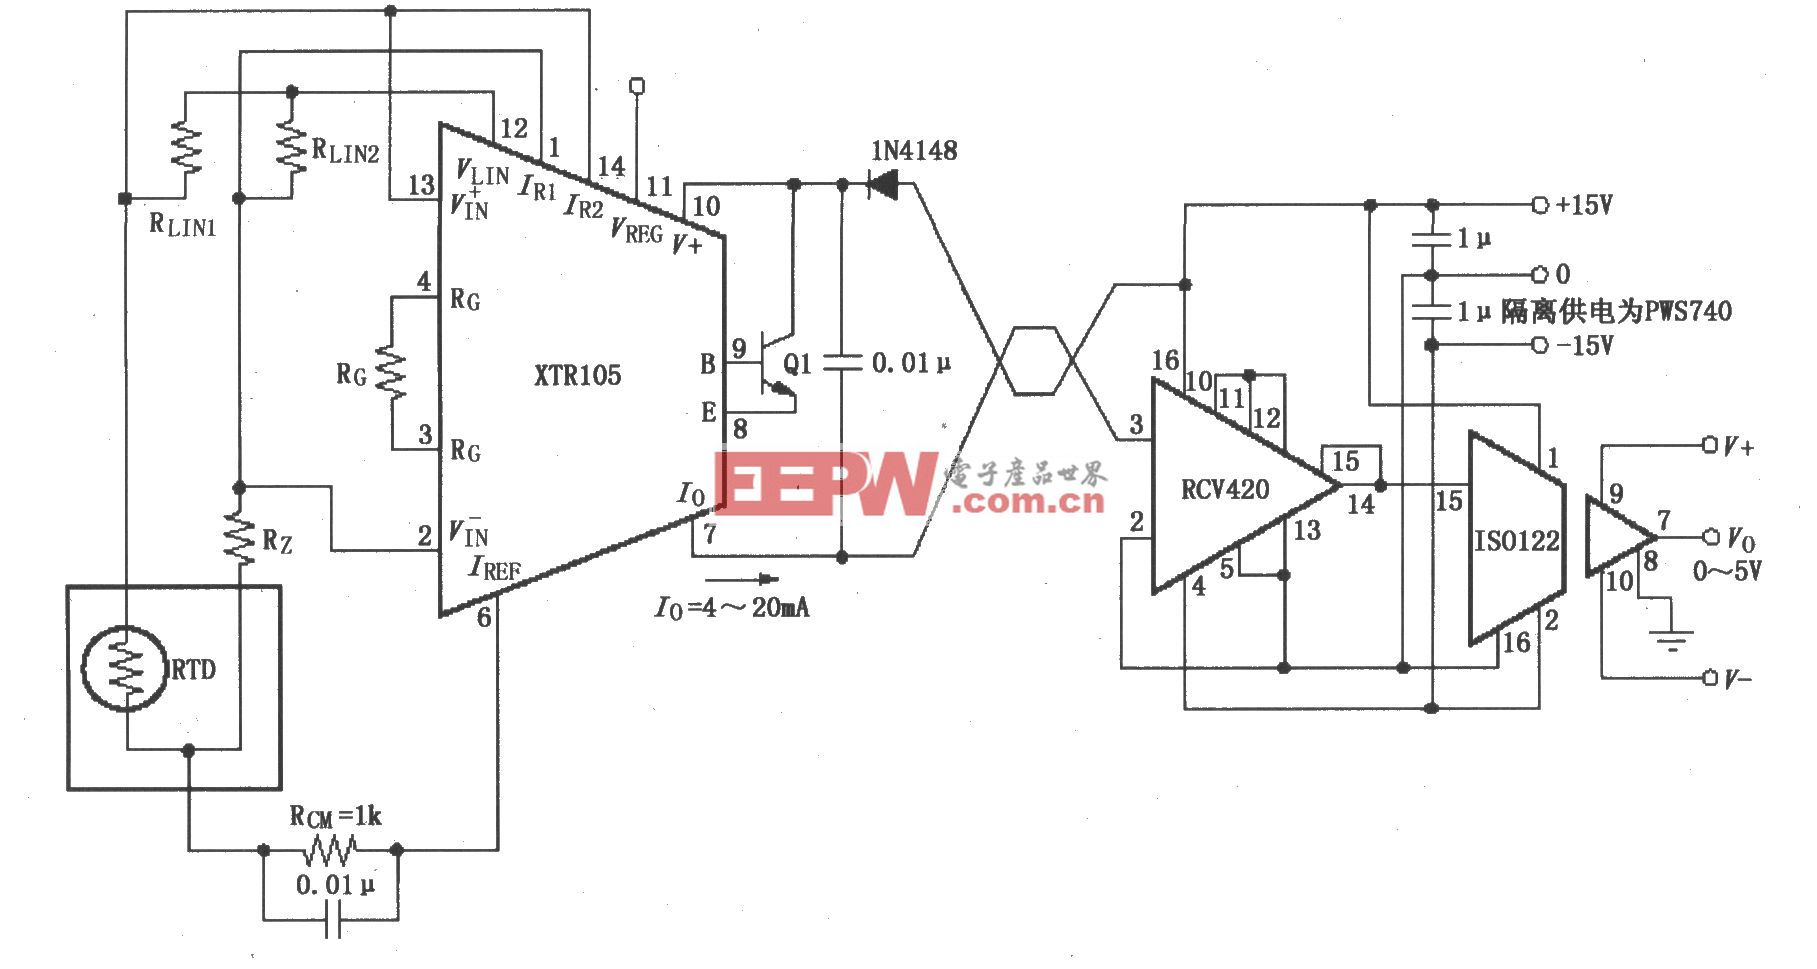 RCV420隔離式4~20mA儀表環路(RTD)